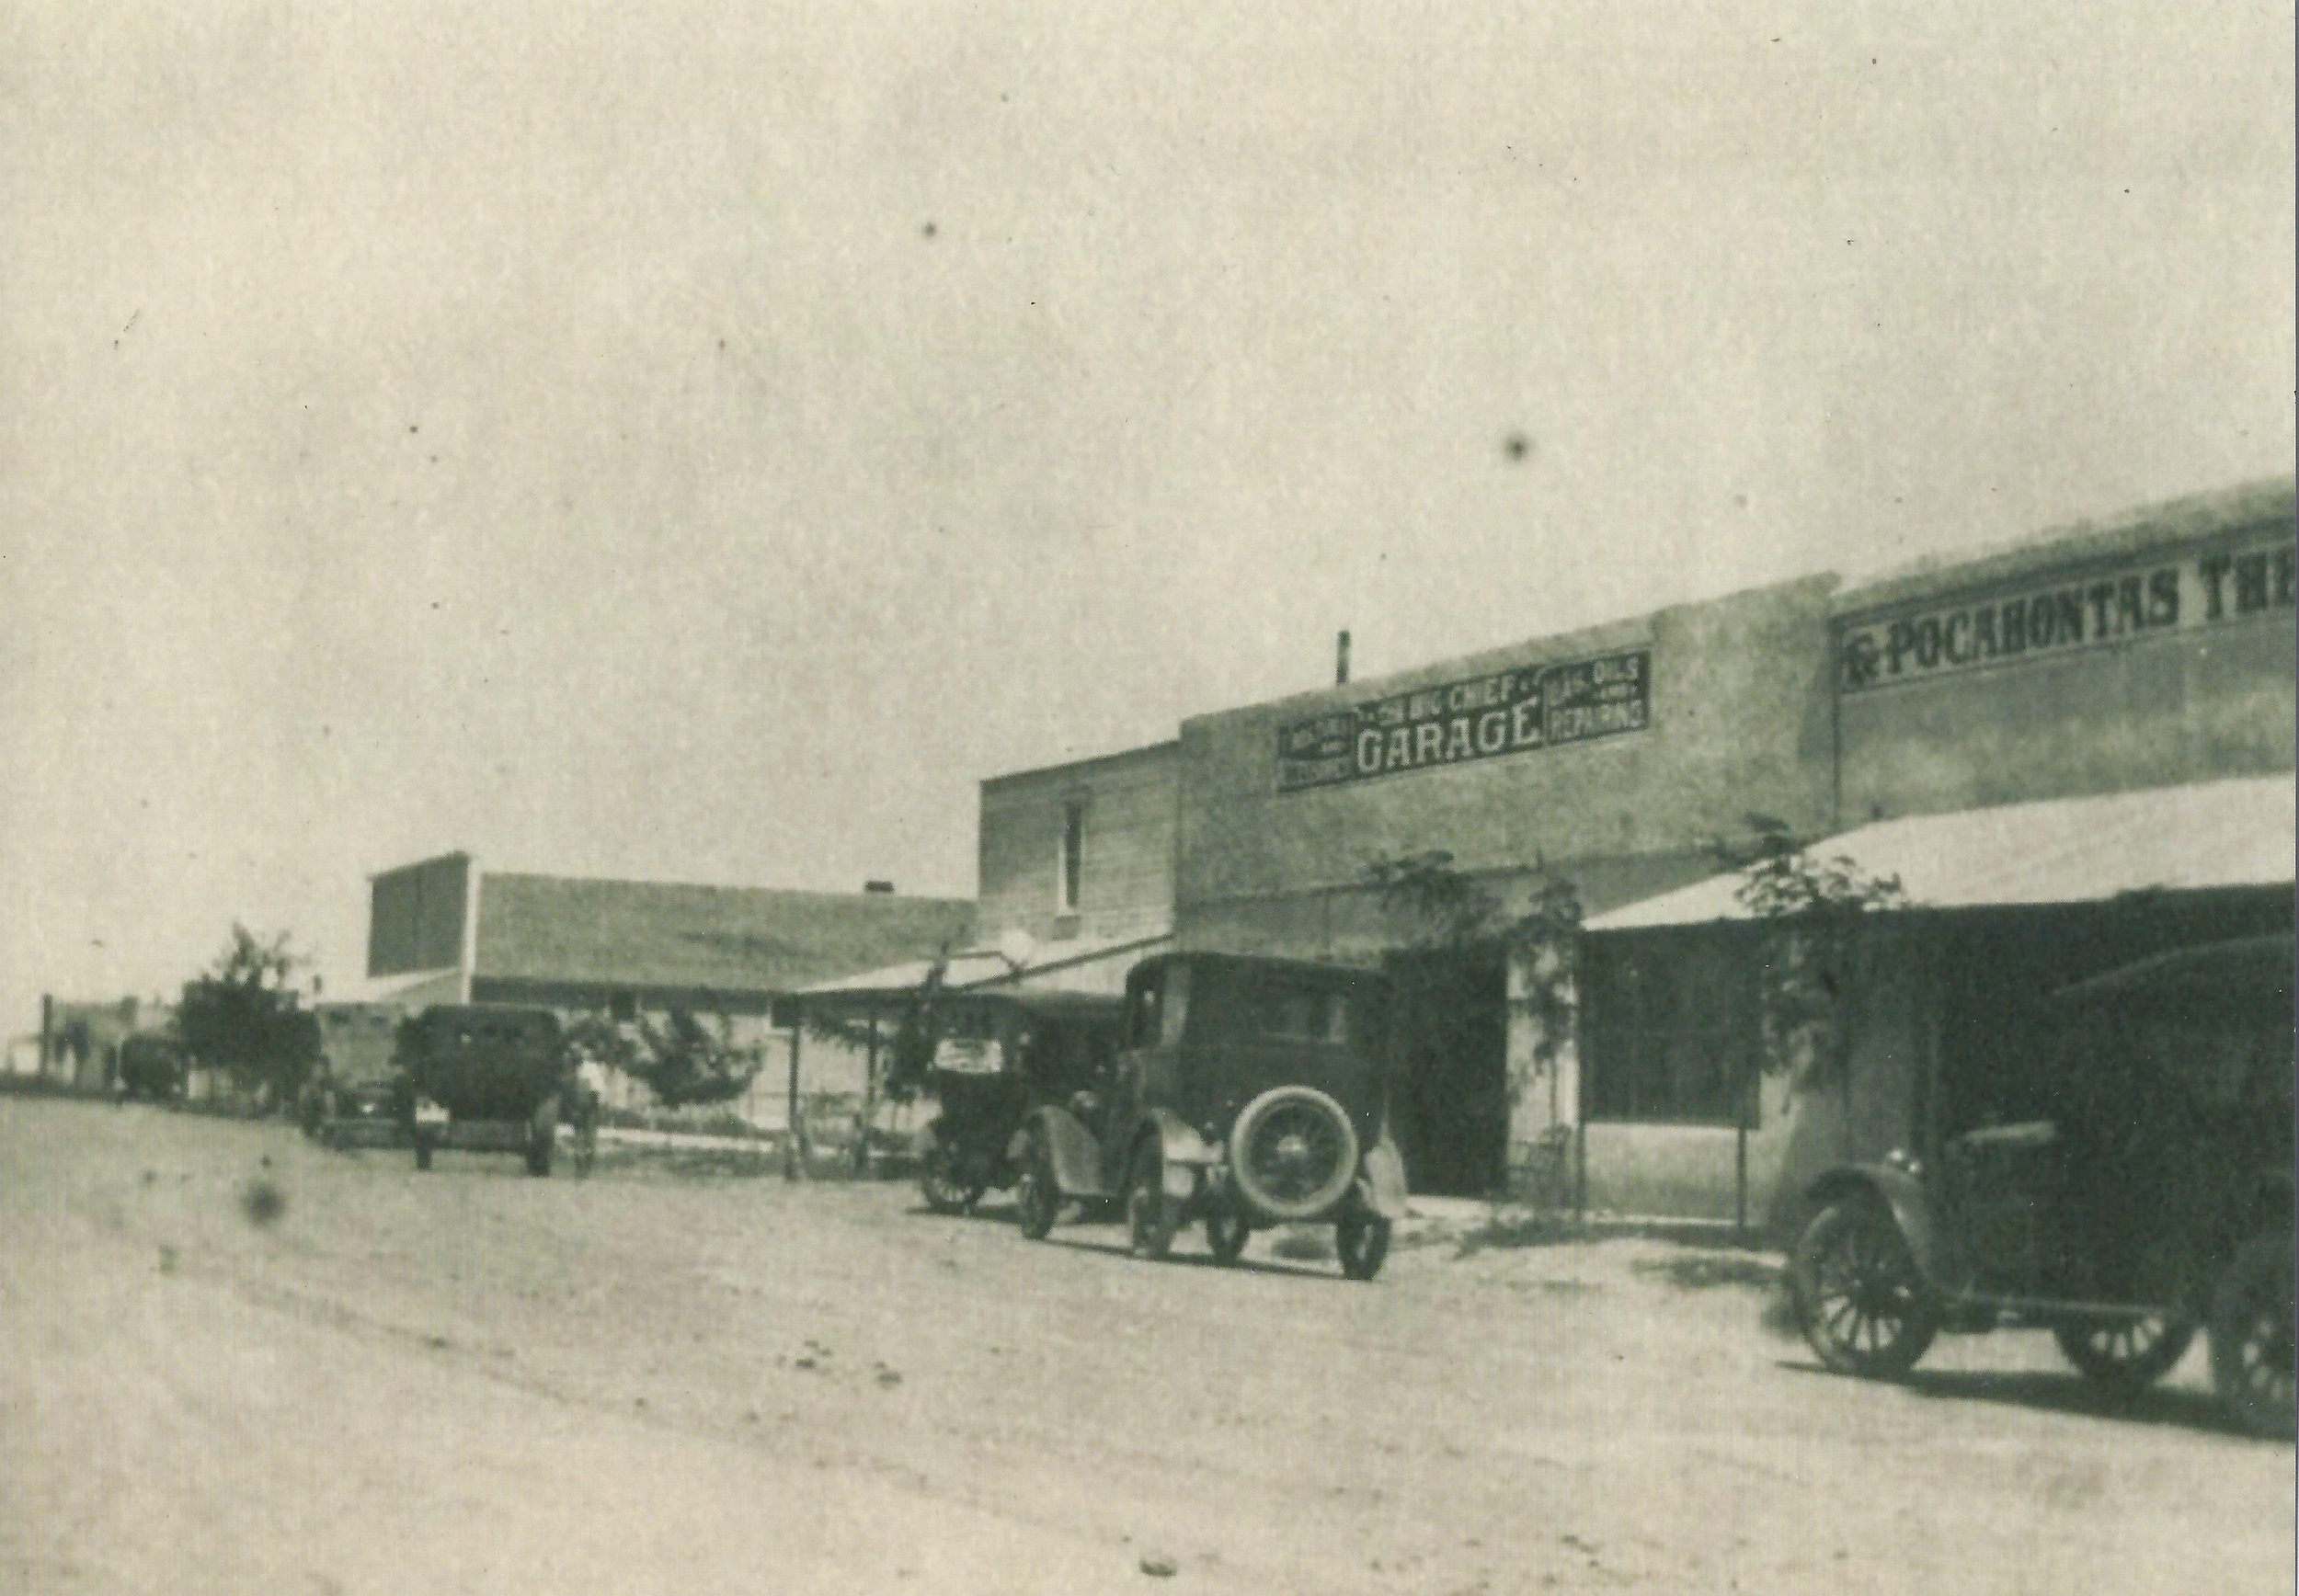 The Big Chief Garage and The Pocahontas Theatre on main street in Satanta, Kansas.